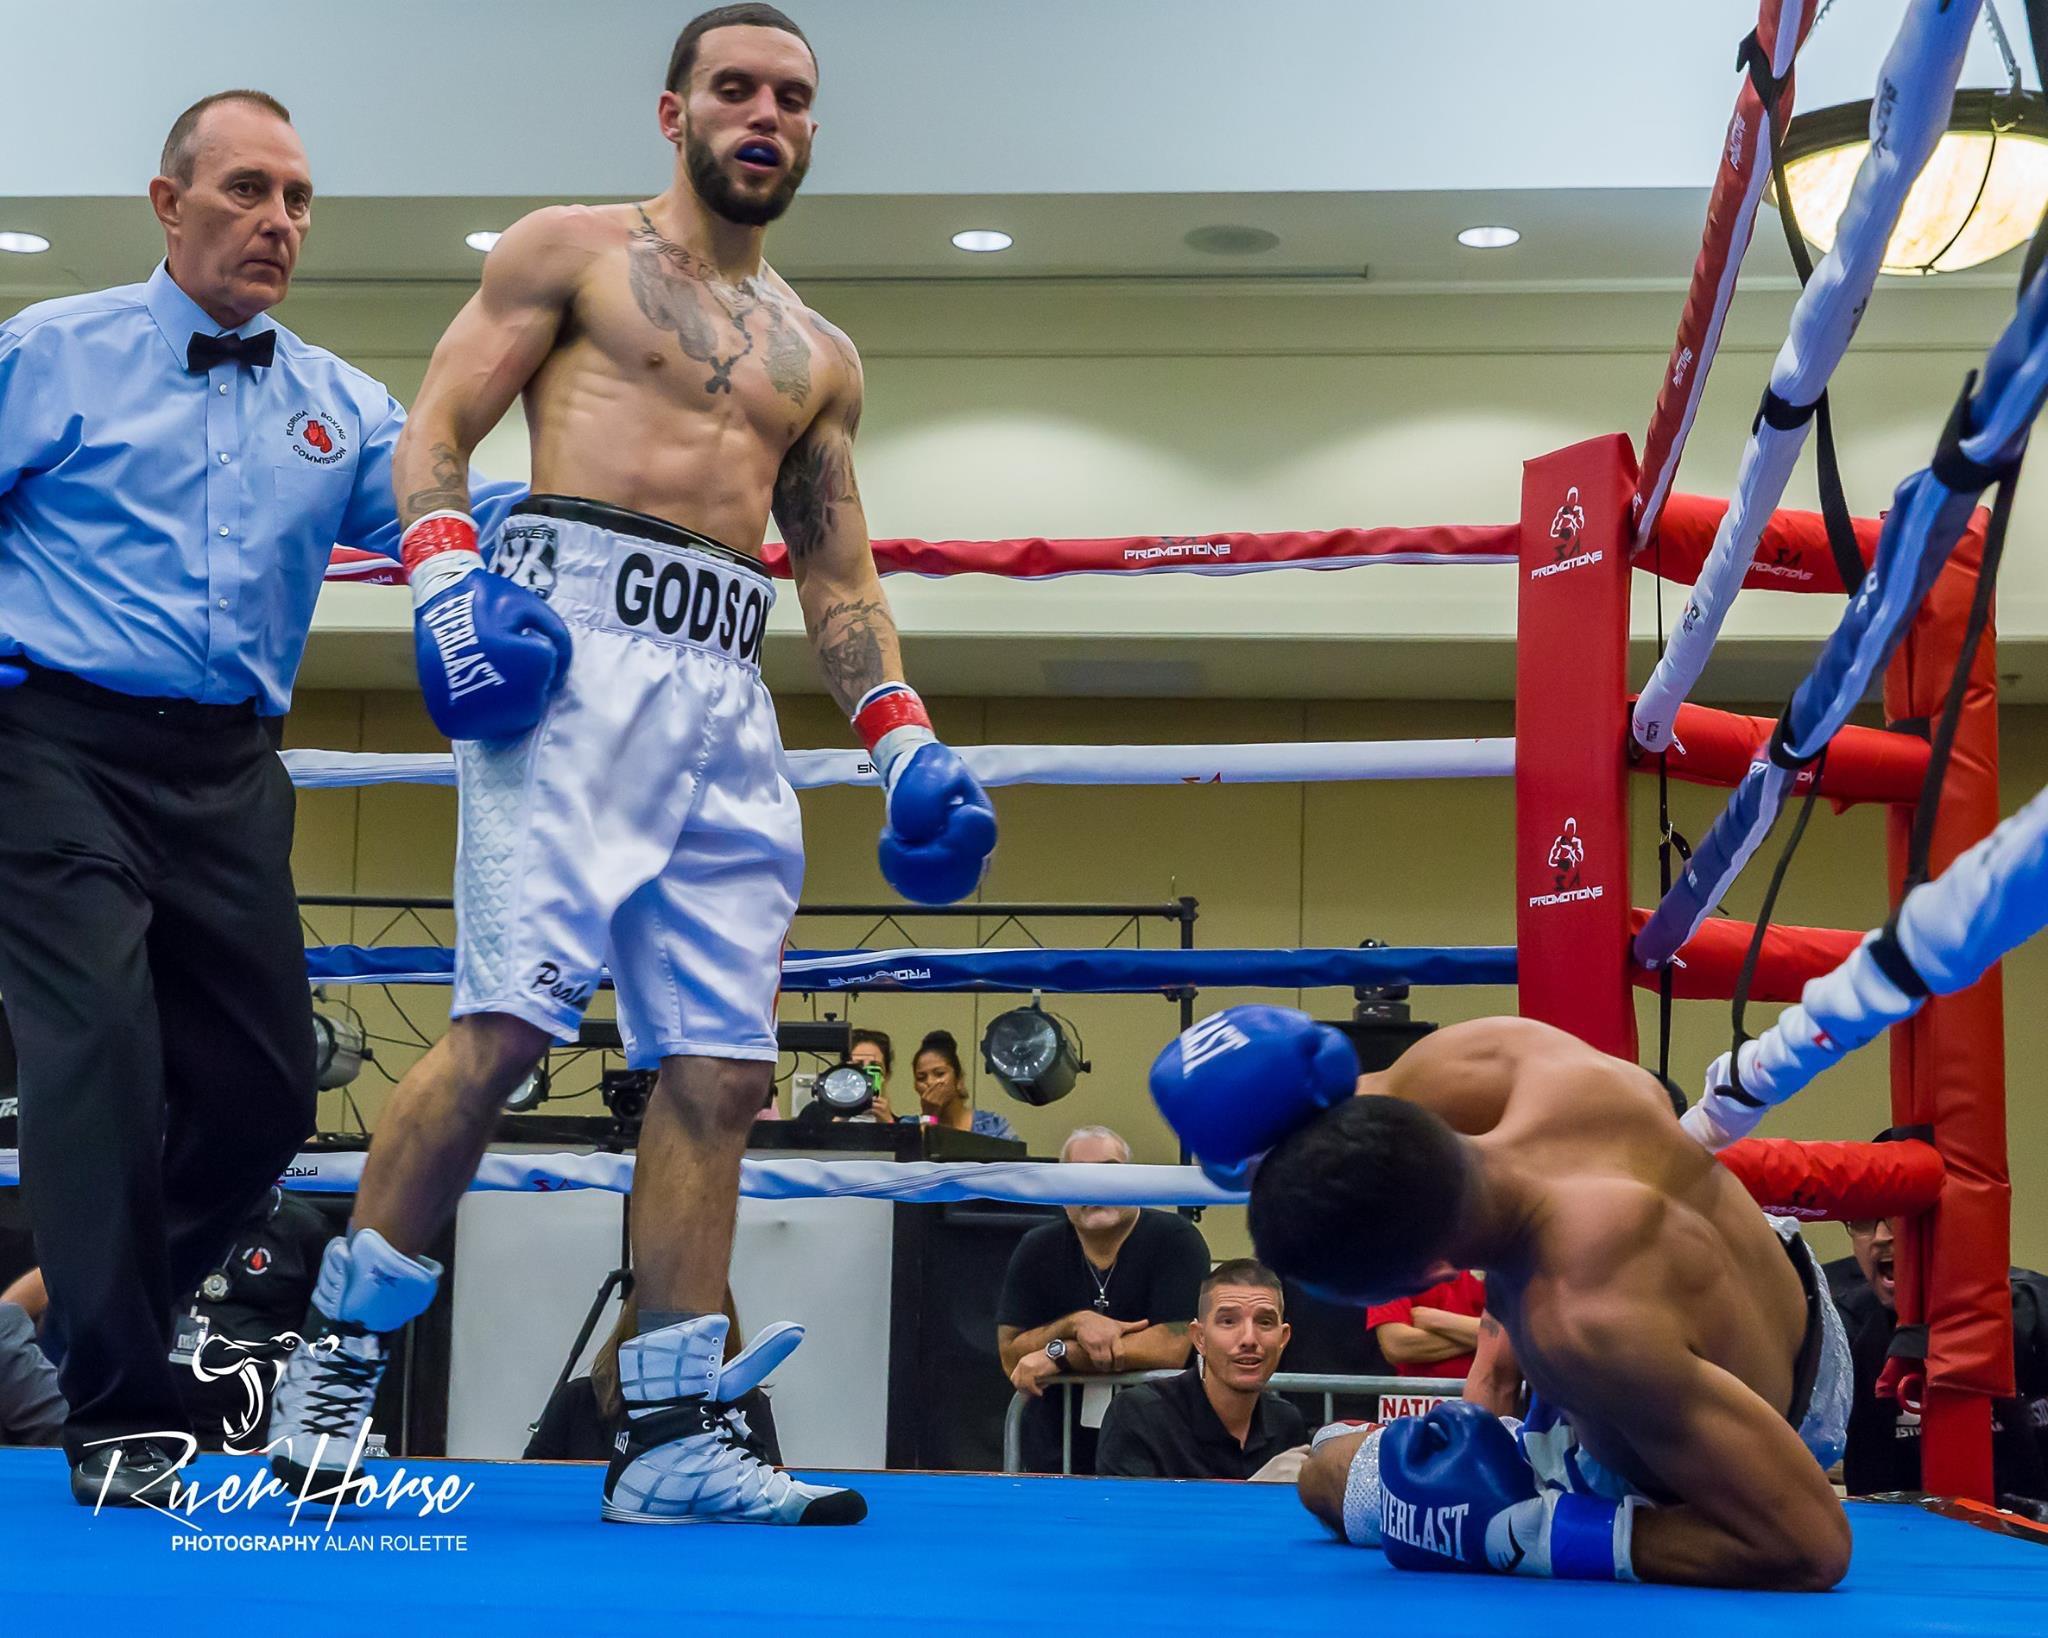 Dustin Arnold scores a knockdown on Evander Lamourt. Photo: Alan Rolette/RiverHorse Photography